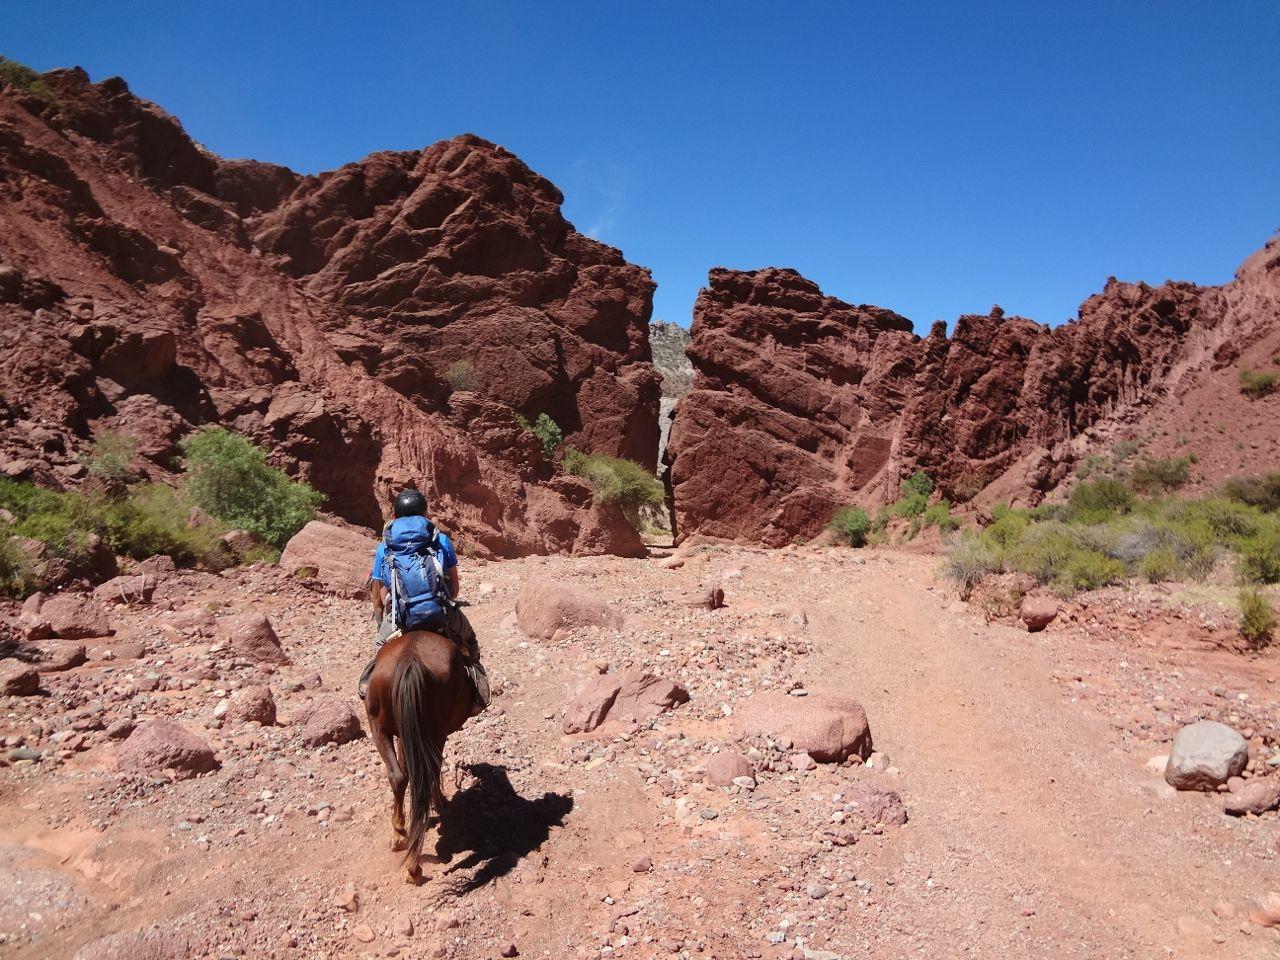 <strong>Zu Pferd (Nochero) auf dem Weg in Richtung Puerta del Diablo</strong>